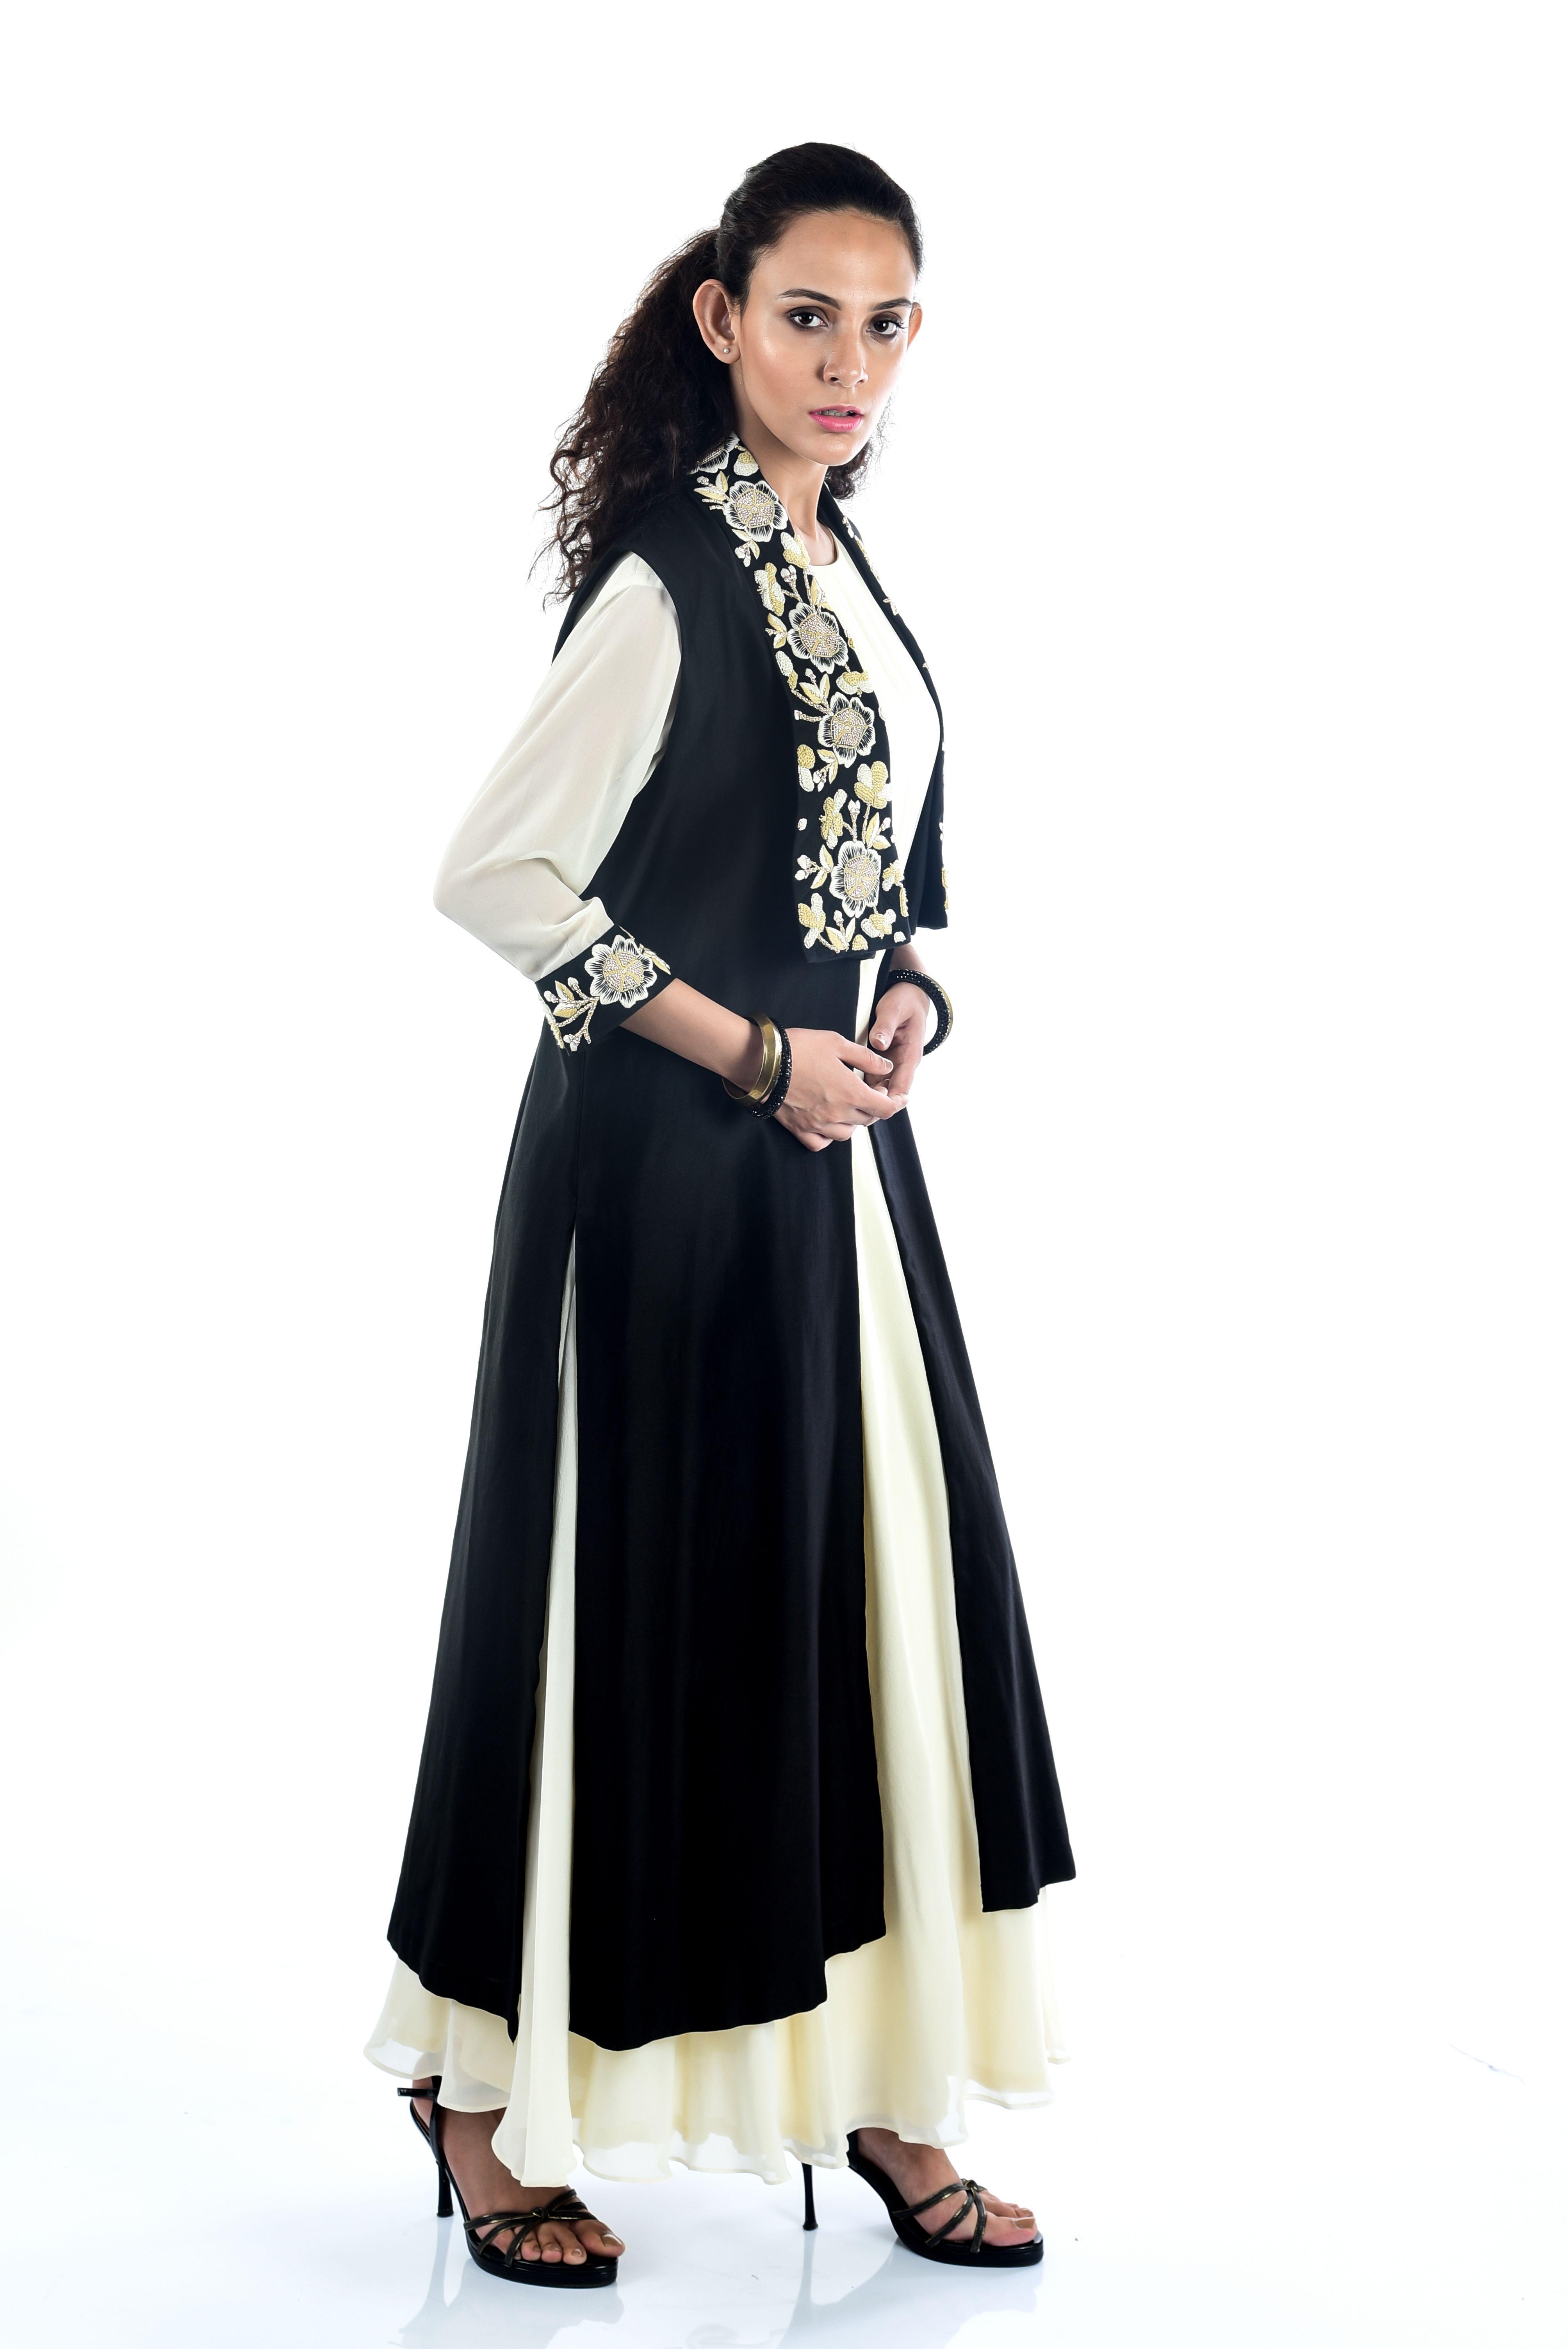 Party Wear Designer Dresses For Women In Kolkata Devika Churiwal Is